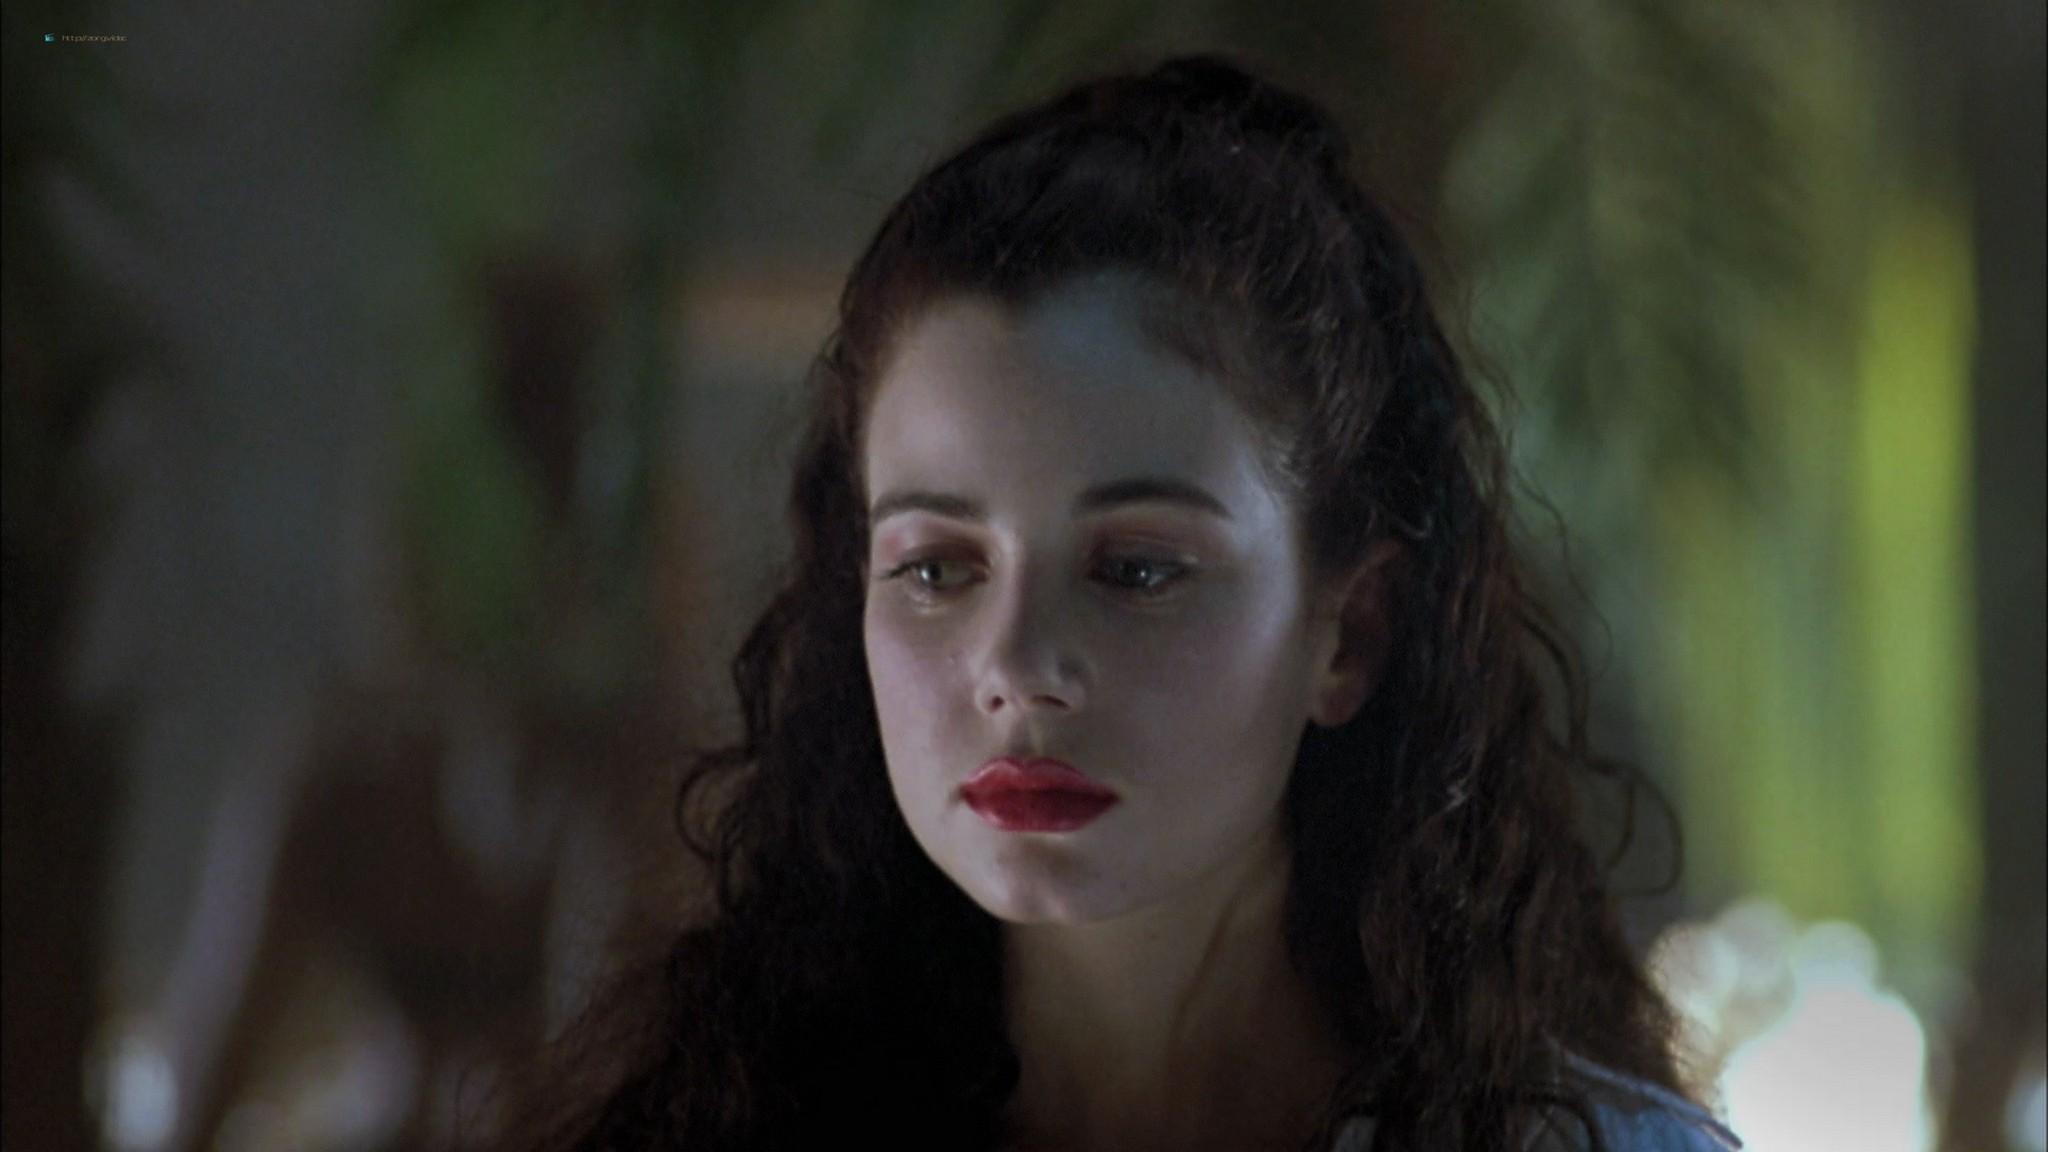 Mia Kirshner nude Arsinée Khanjian sexy - Exotica (1994) HD 1080p BluRay REMUX (2)